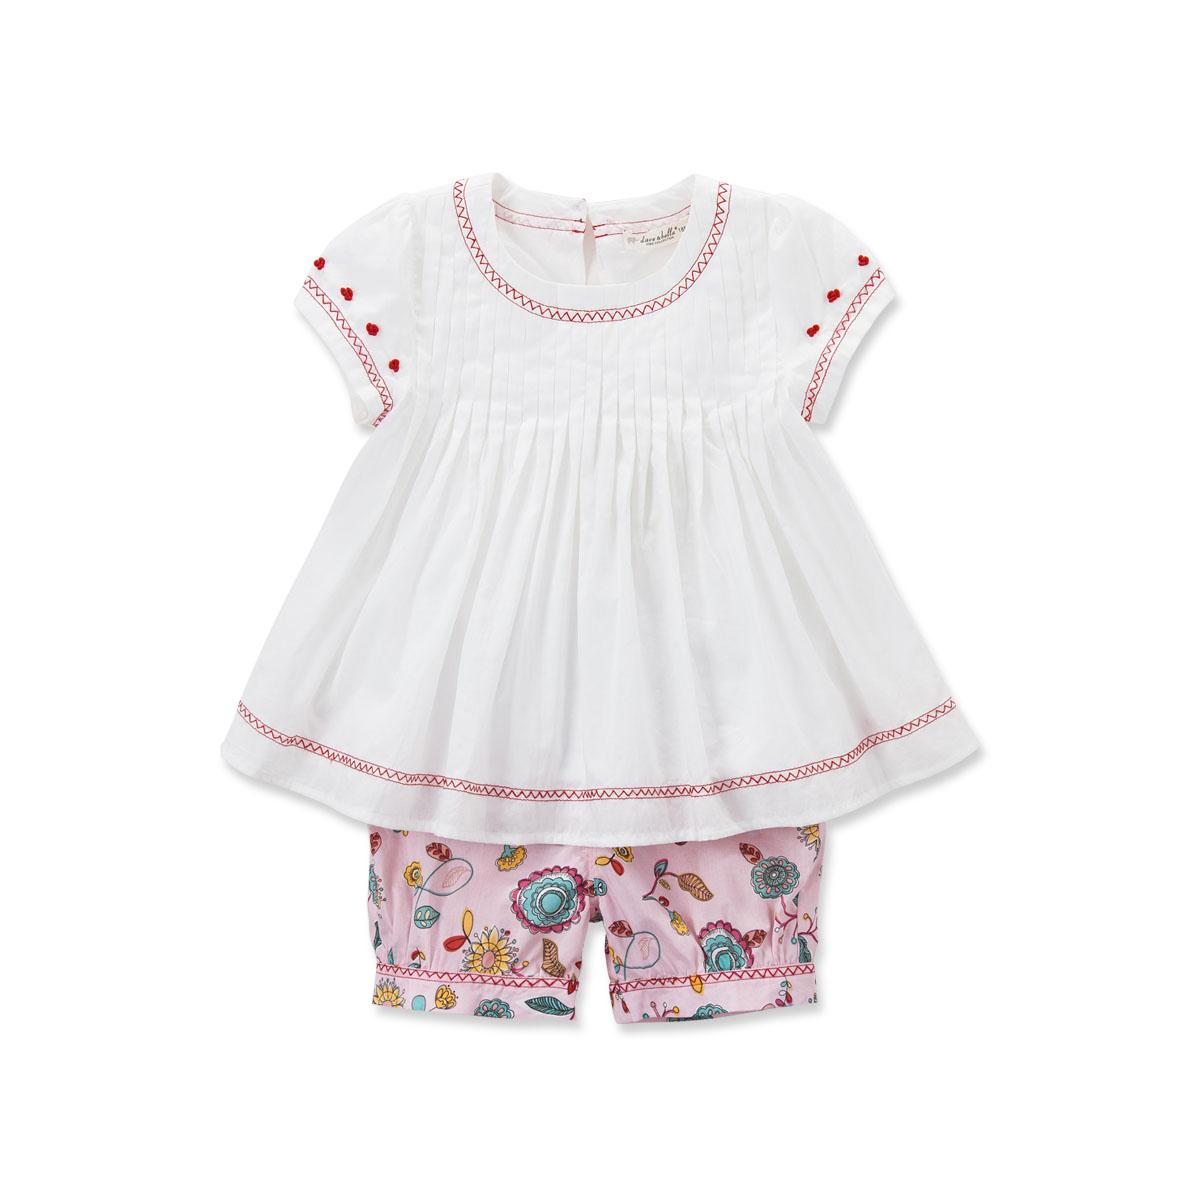 davebella戴维贝拉童装女童夏装短袖套装 女宝宝套装夏